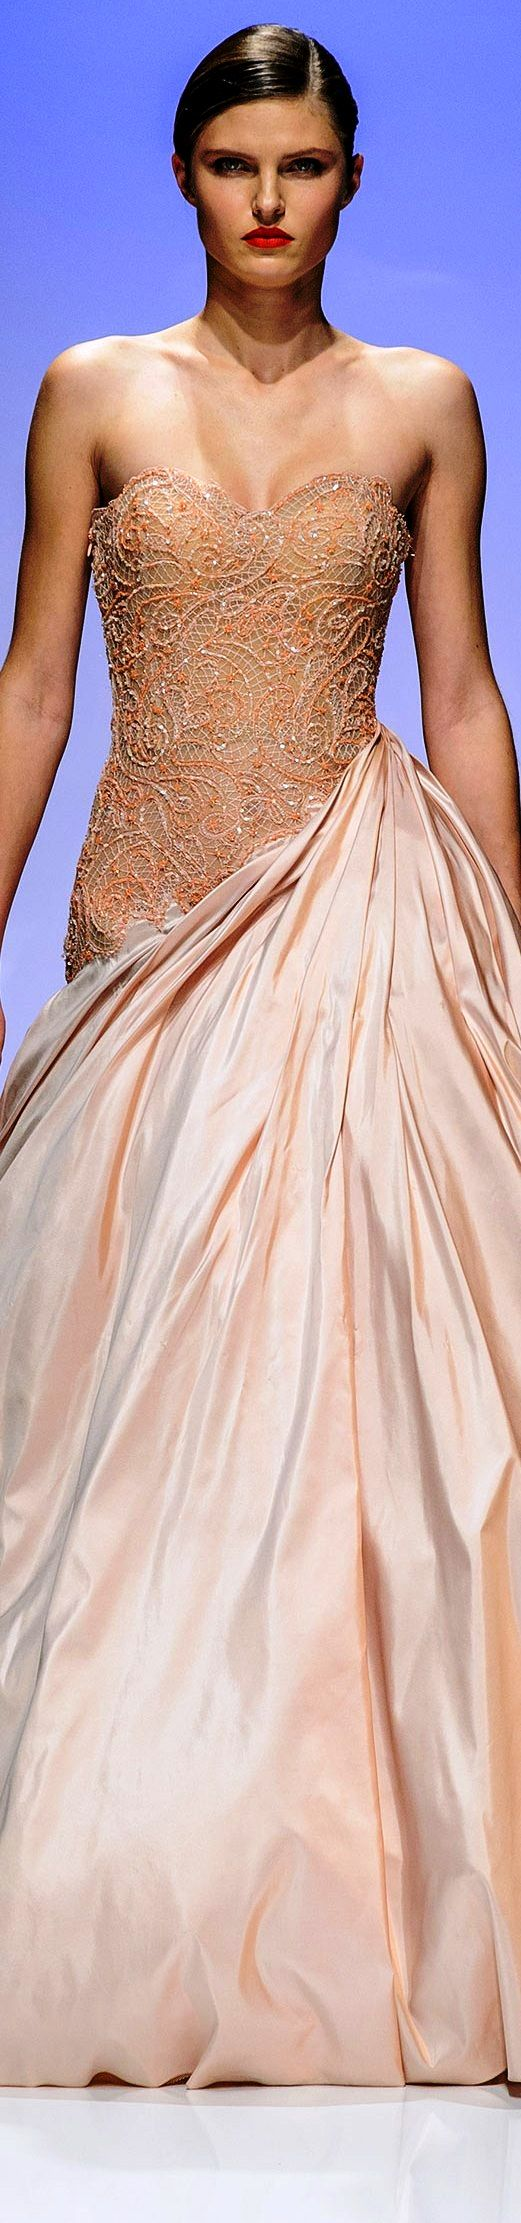 Rani Zakhem Couture Spring-Summer 2016